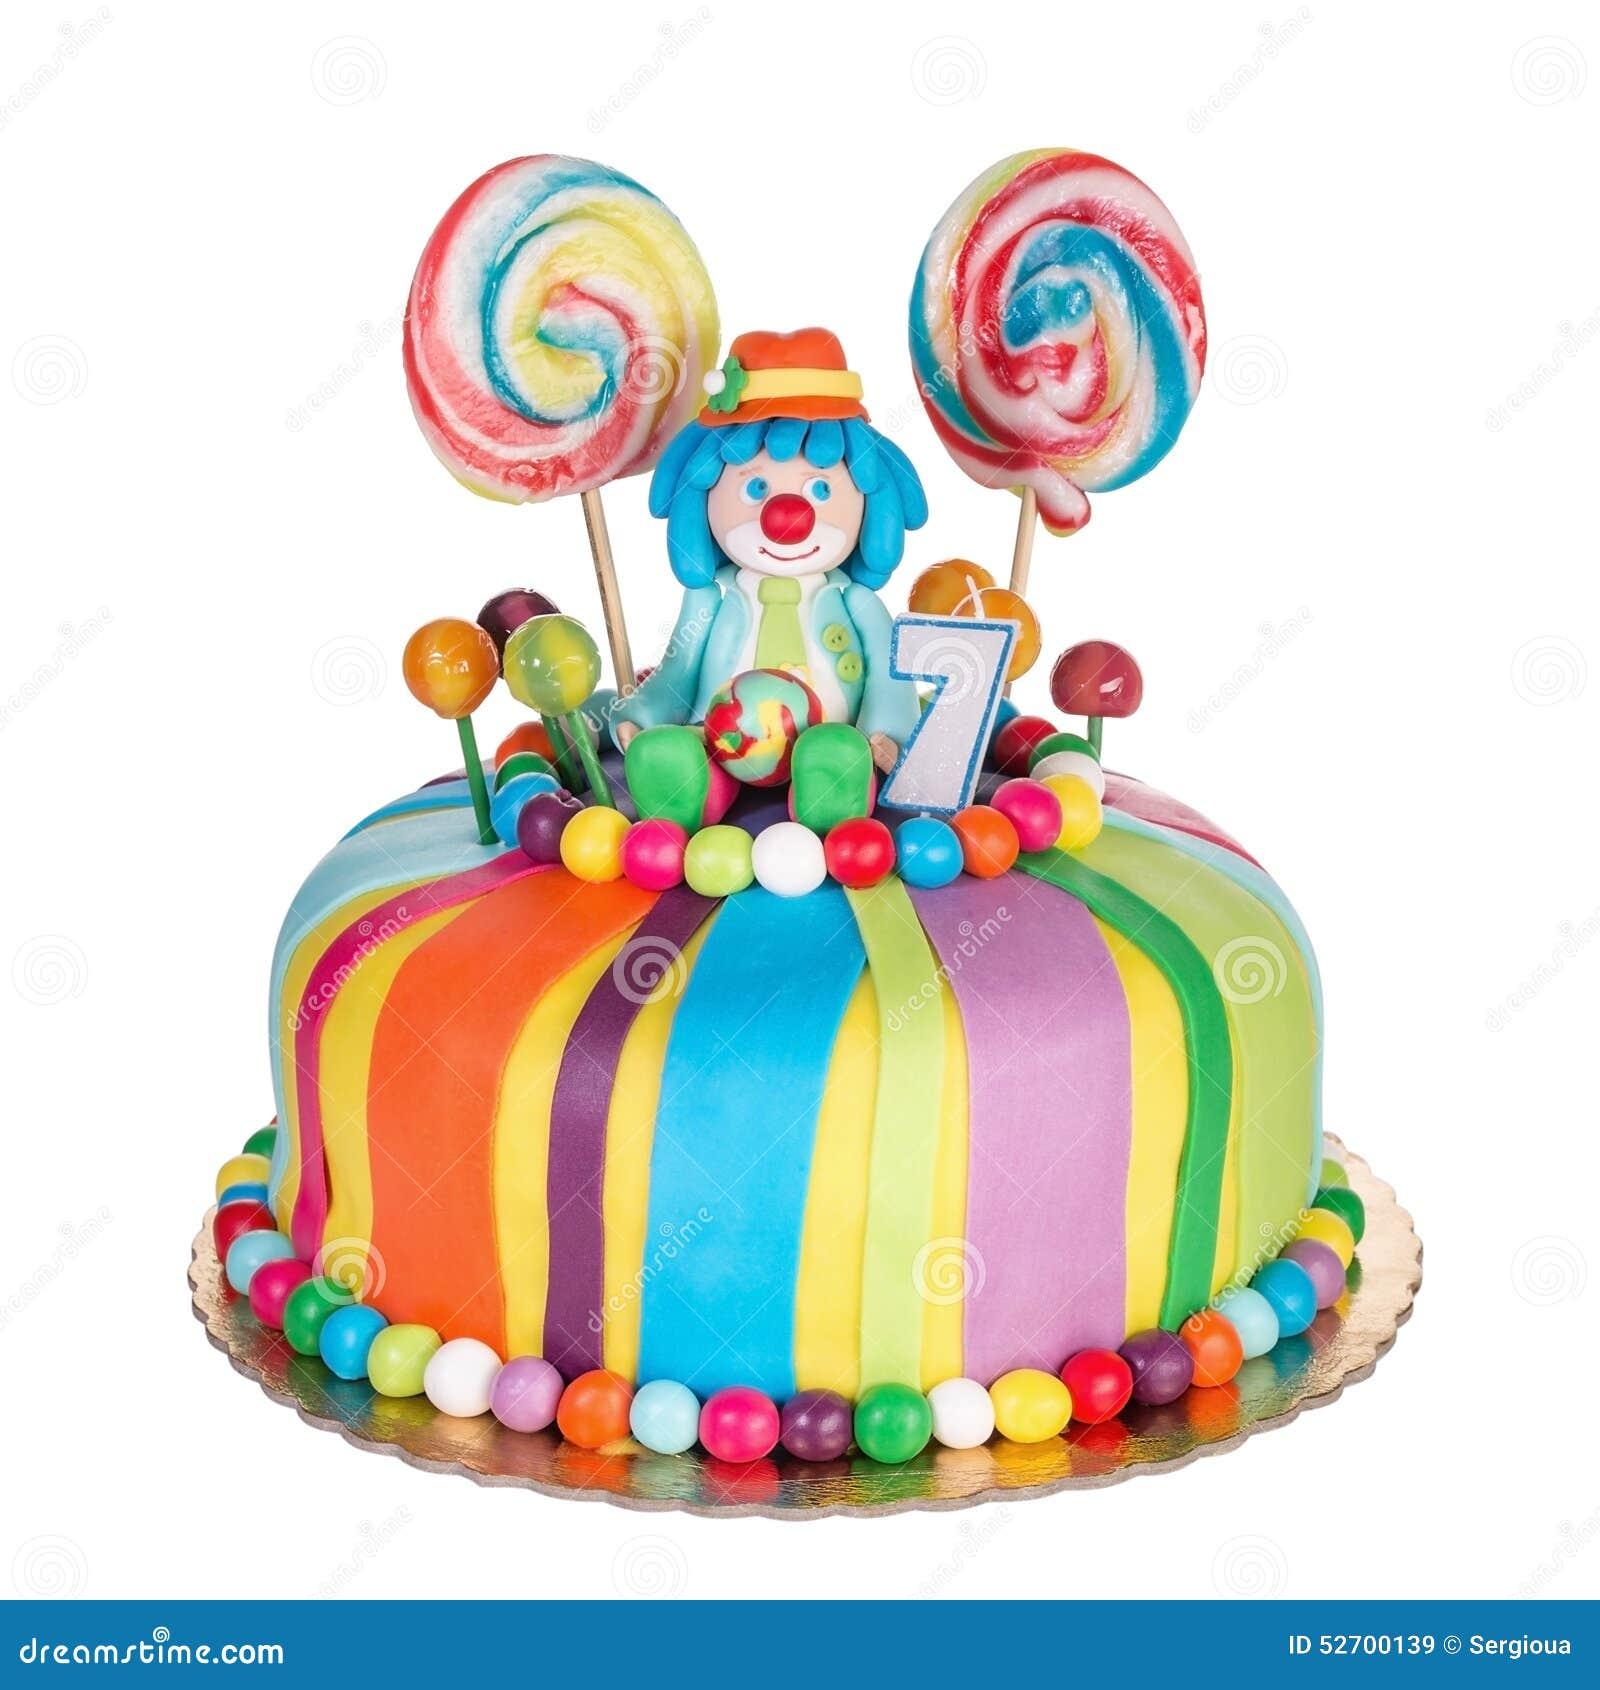 Stupendous Gorgeous Birthday Cake For Children Stock Image Image Of Cakes Funny Birthday Cards Online Fluifree Goldxyz